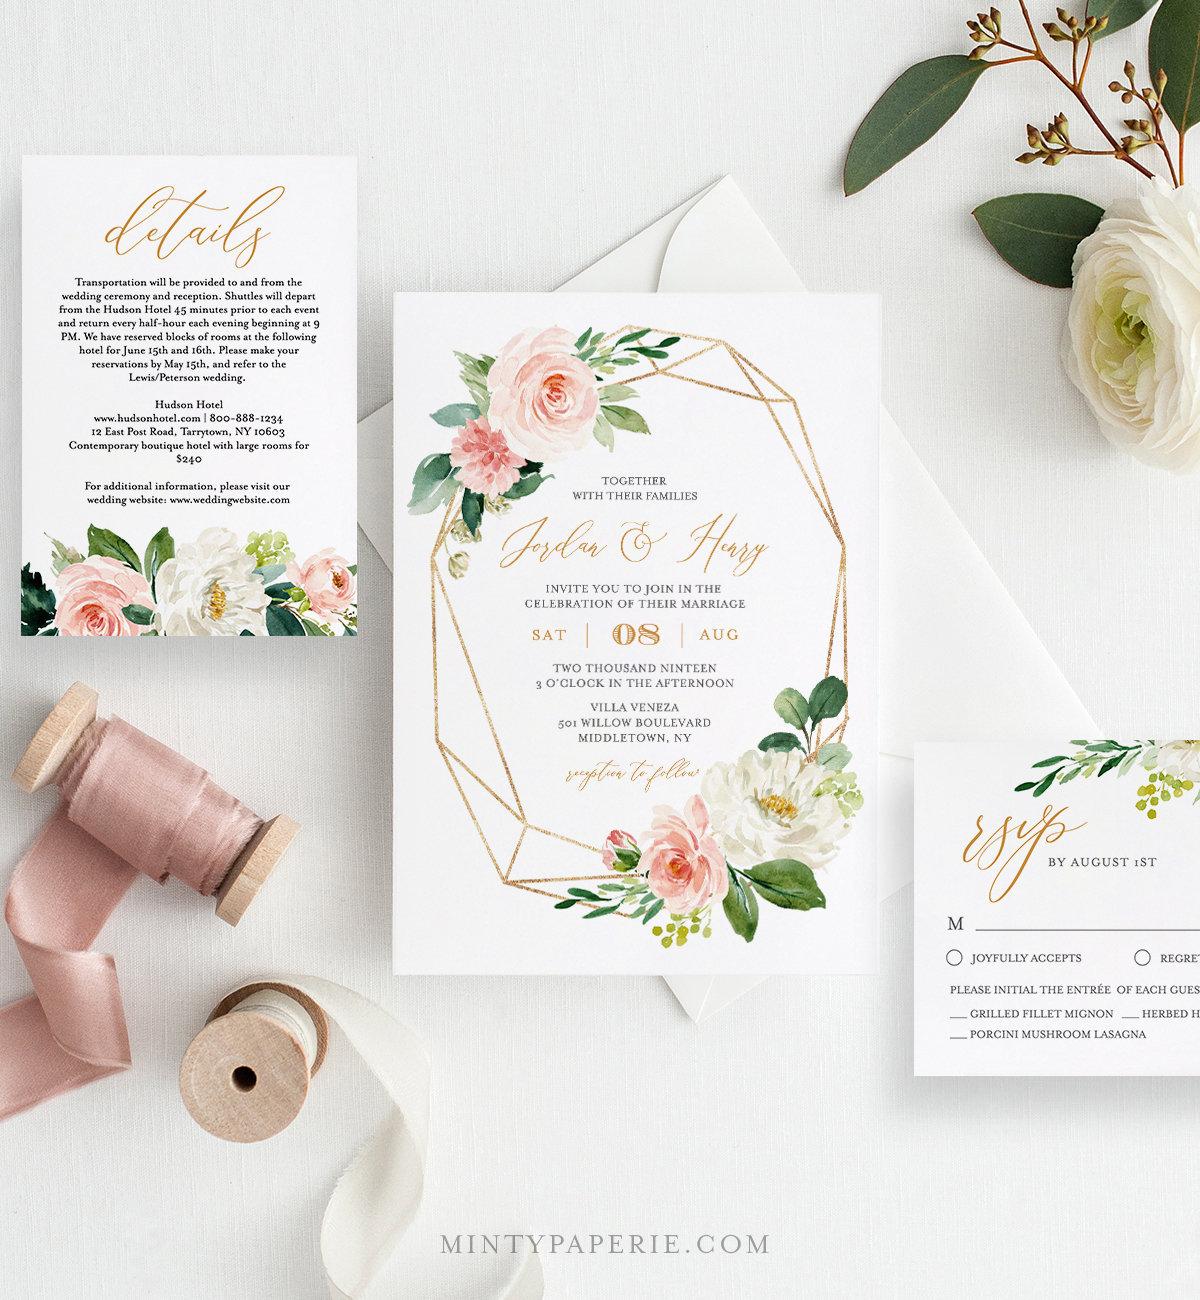 Edit Wedding Invitation Card: Self-Editing Wedding Invitation Set 100% Editable Template